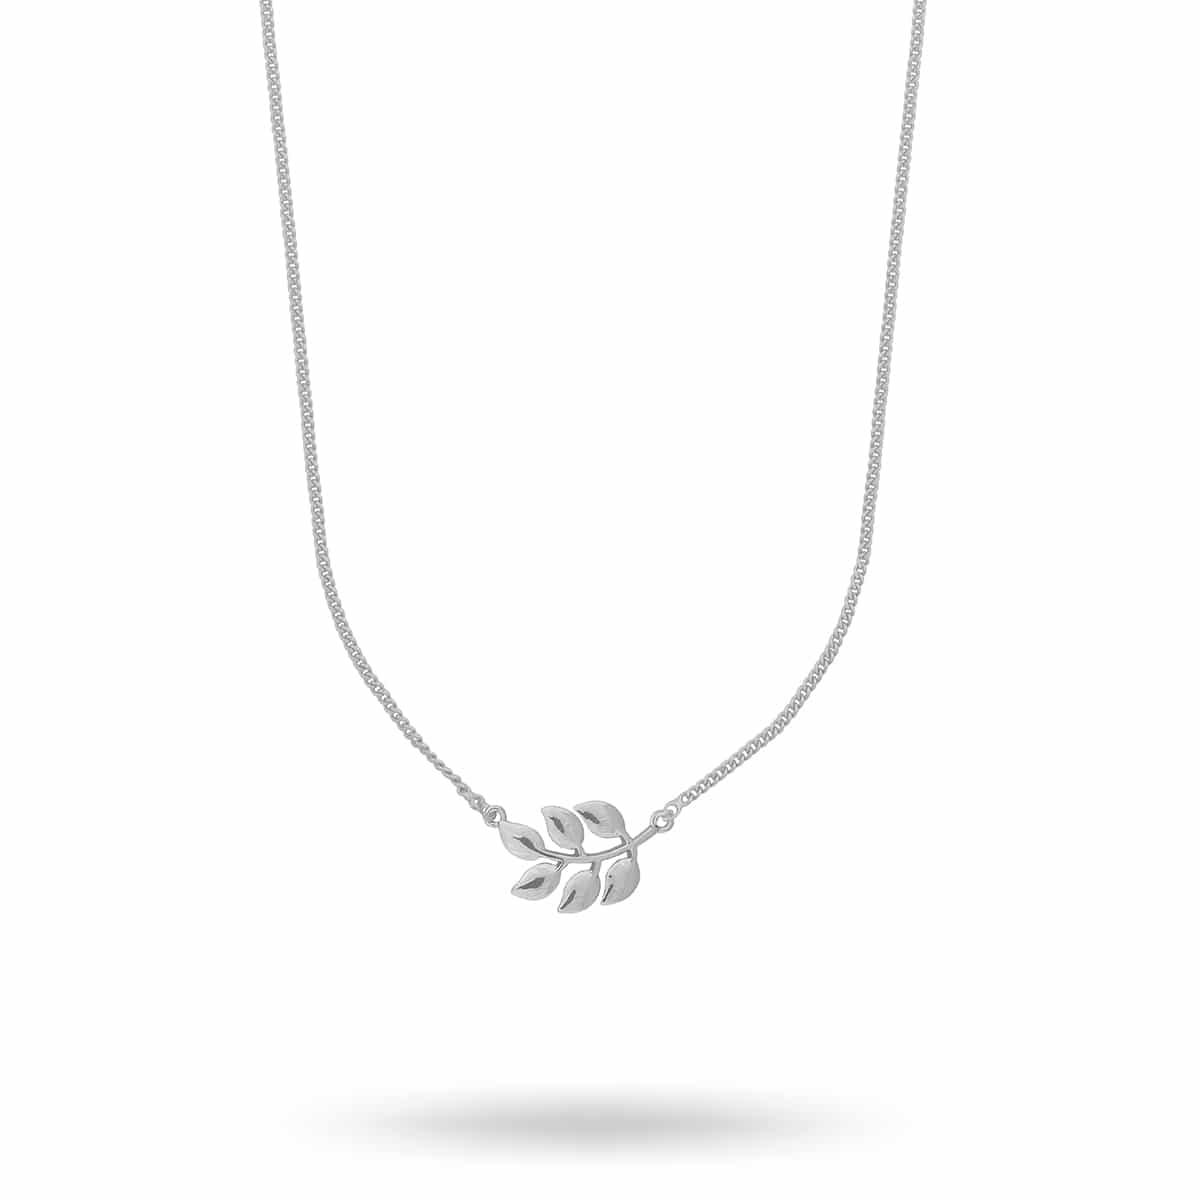 Leaf-chain-80-plain-s-812-0409256